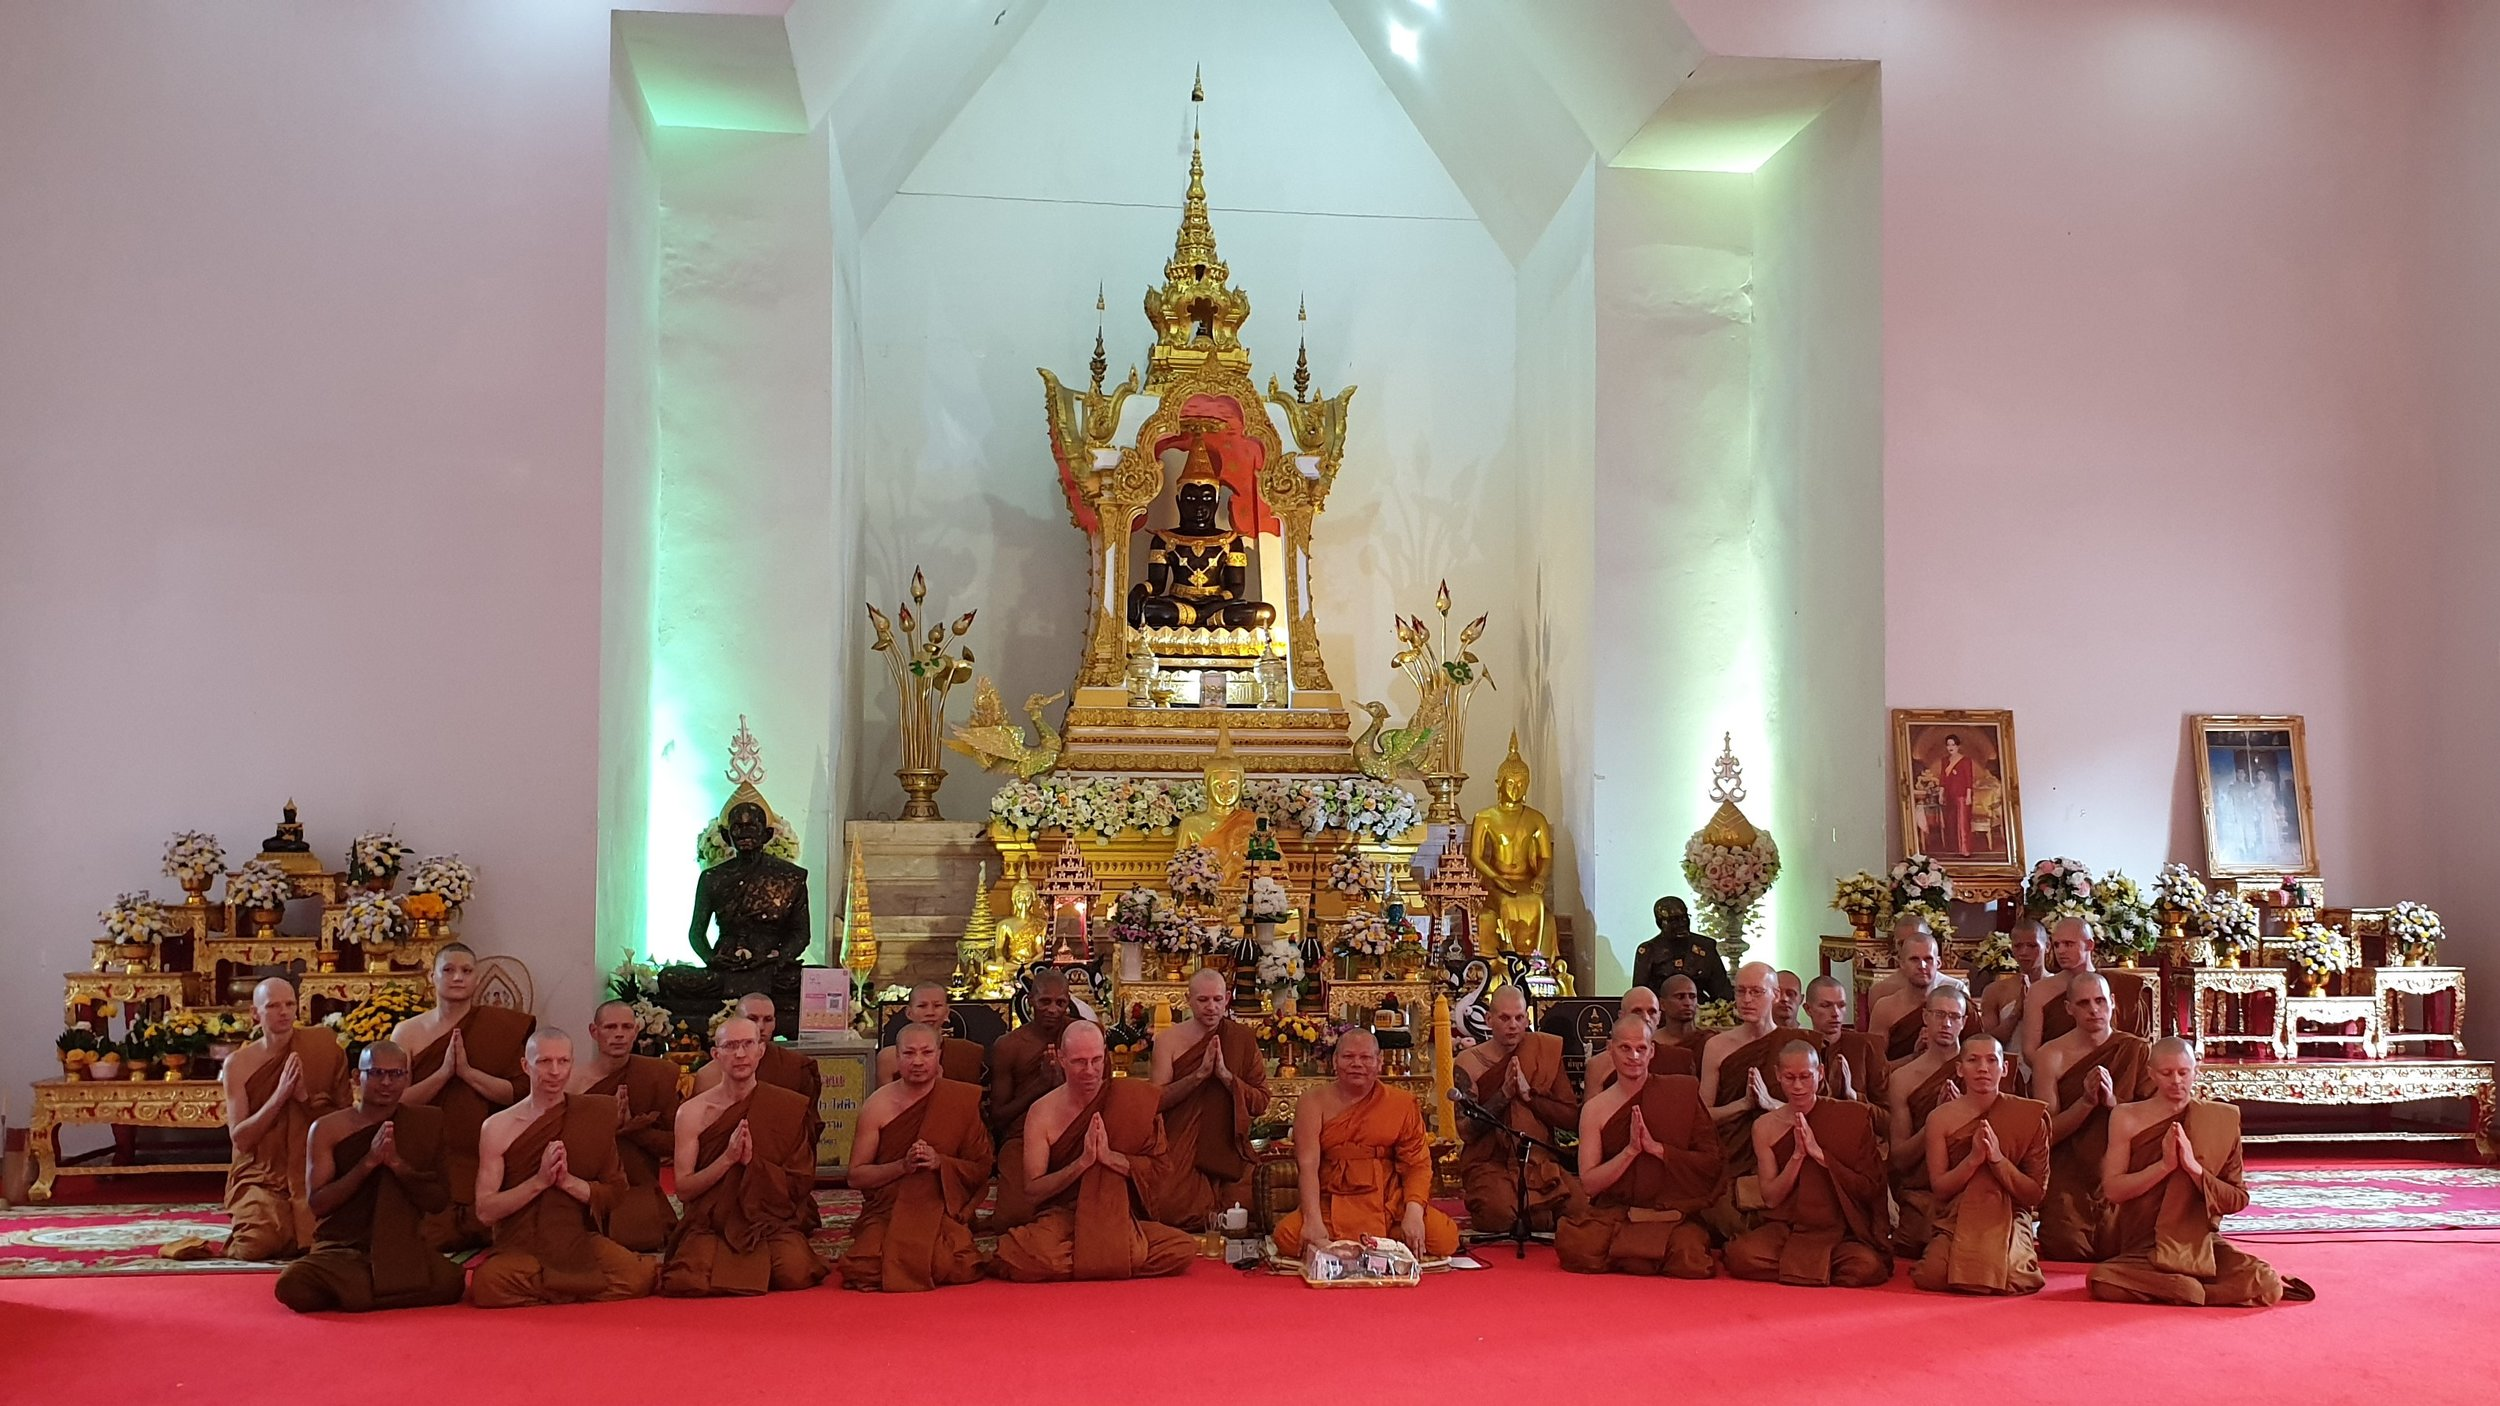 at Wat Manivanaram with Luang Por Phra Thepwarajahn, Jaokana Jangwat Ubon